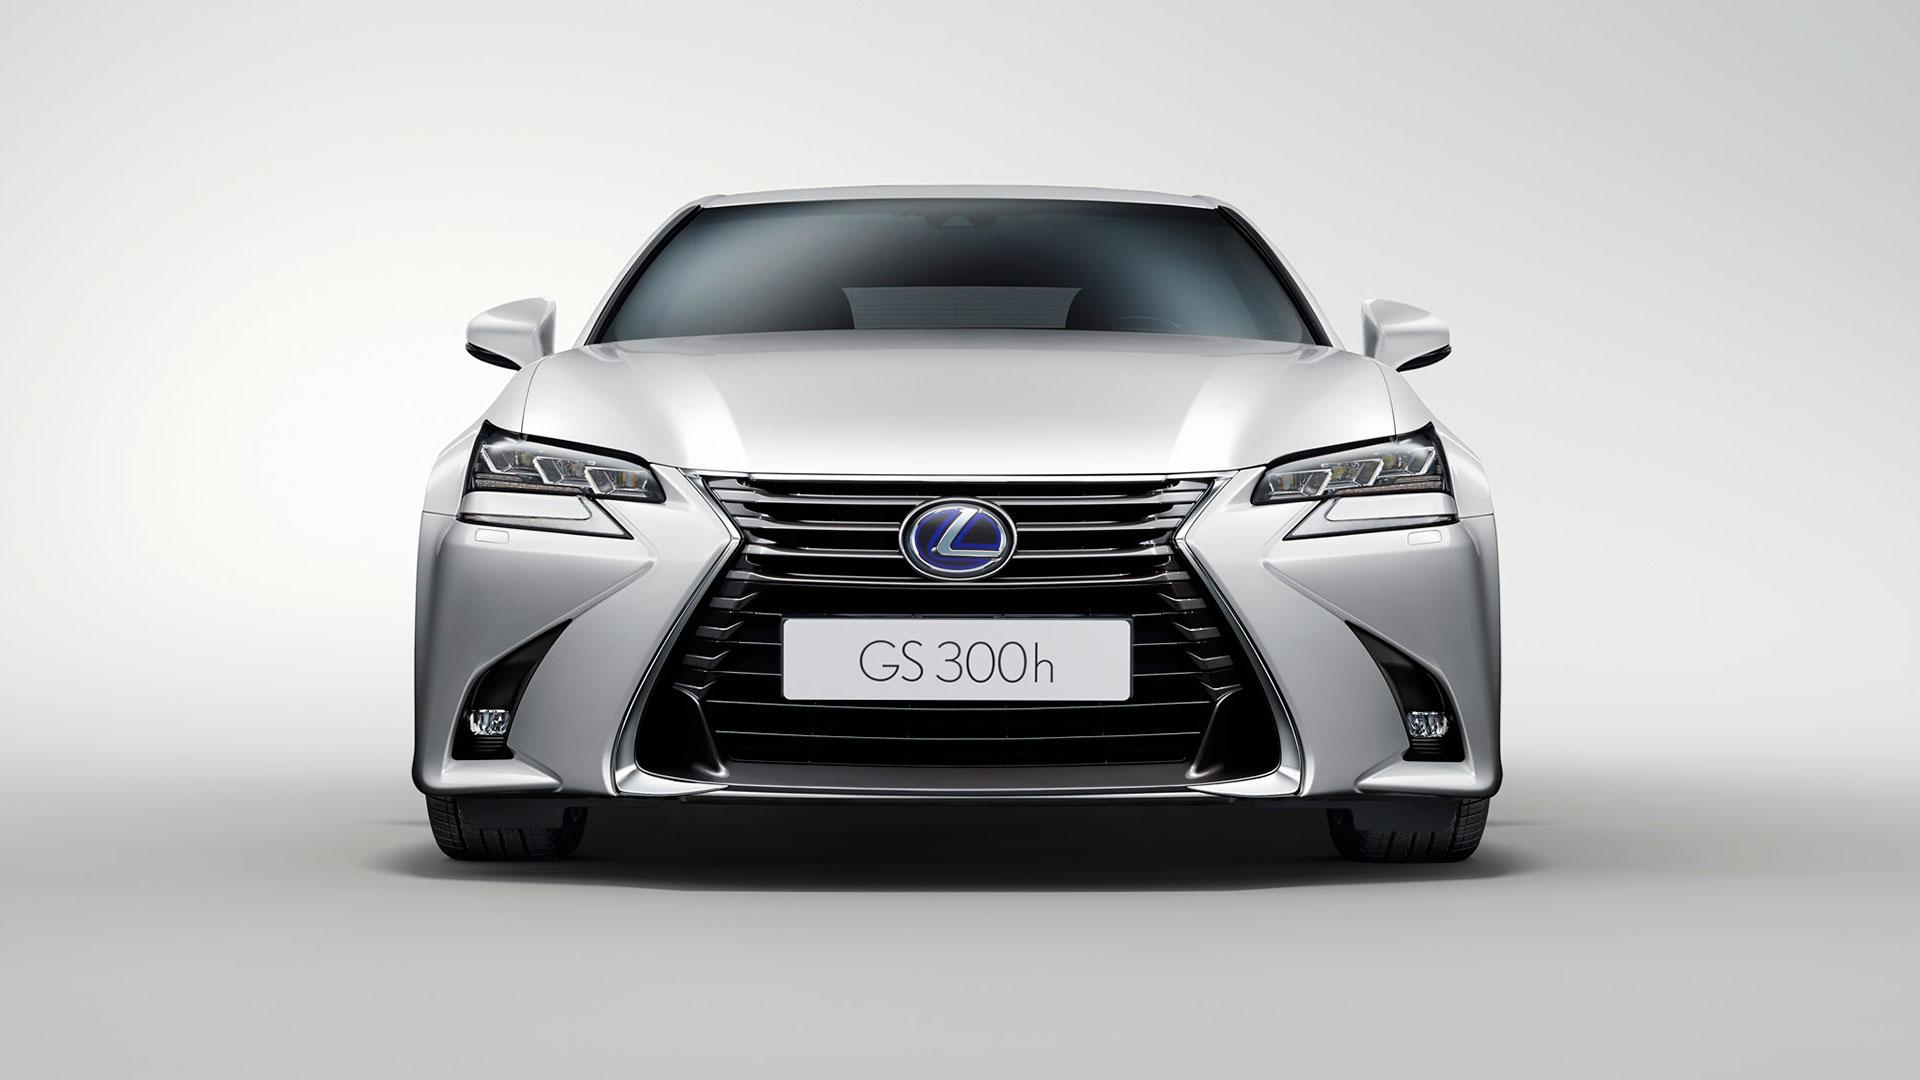 Lexus GS 300h hero asset